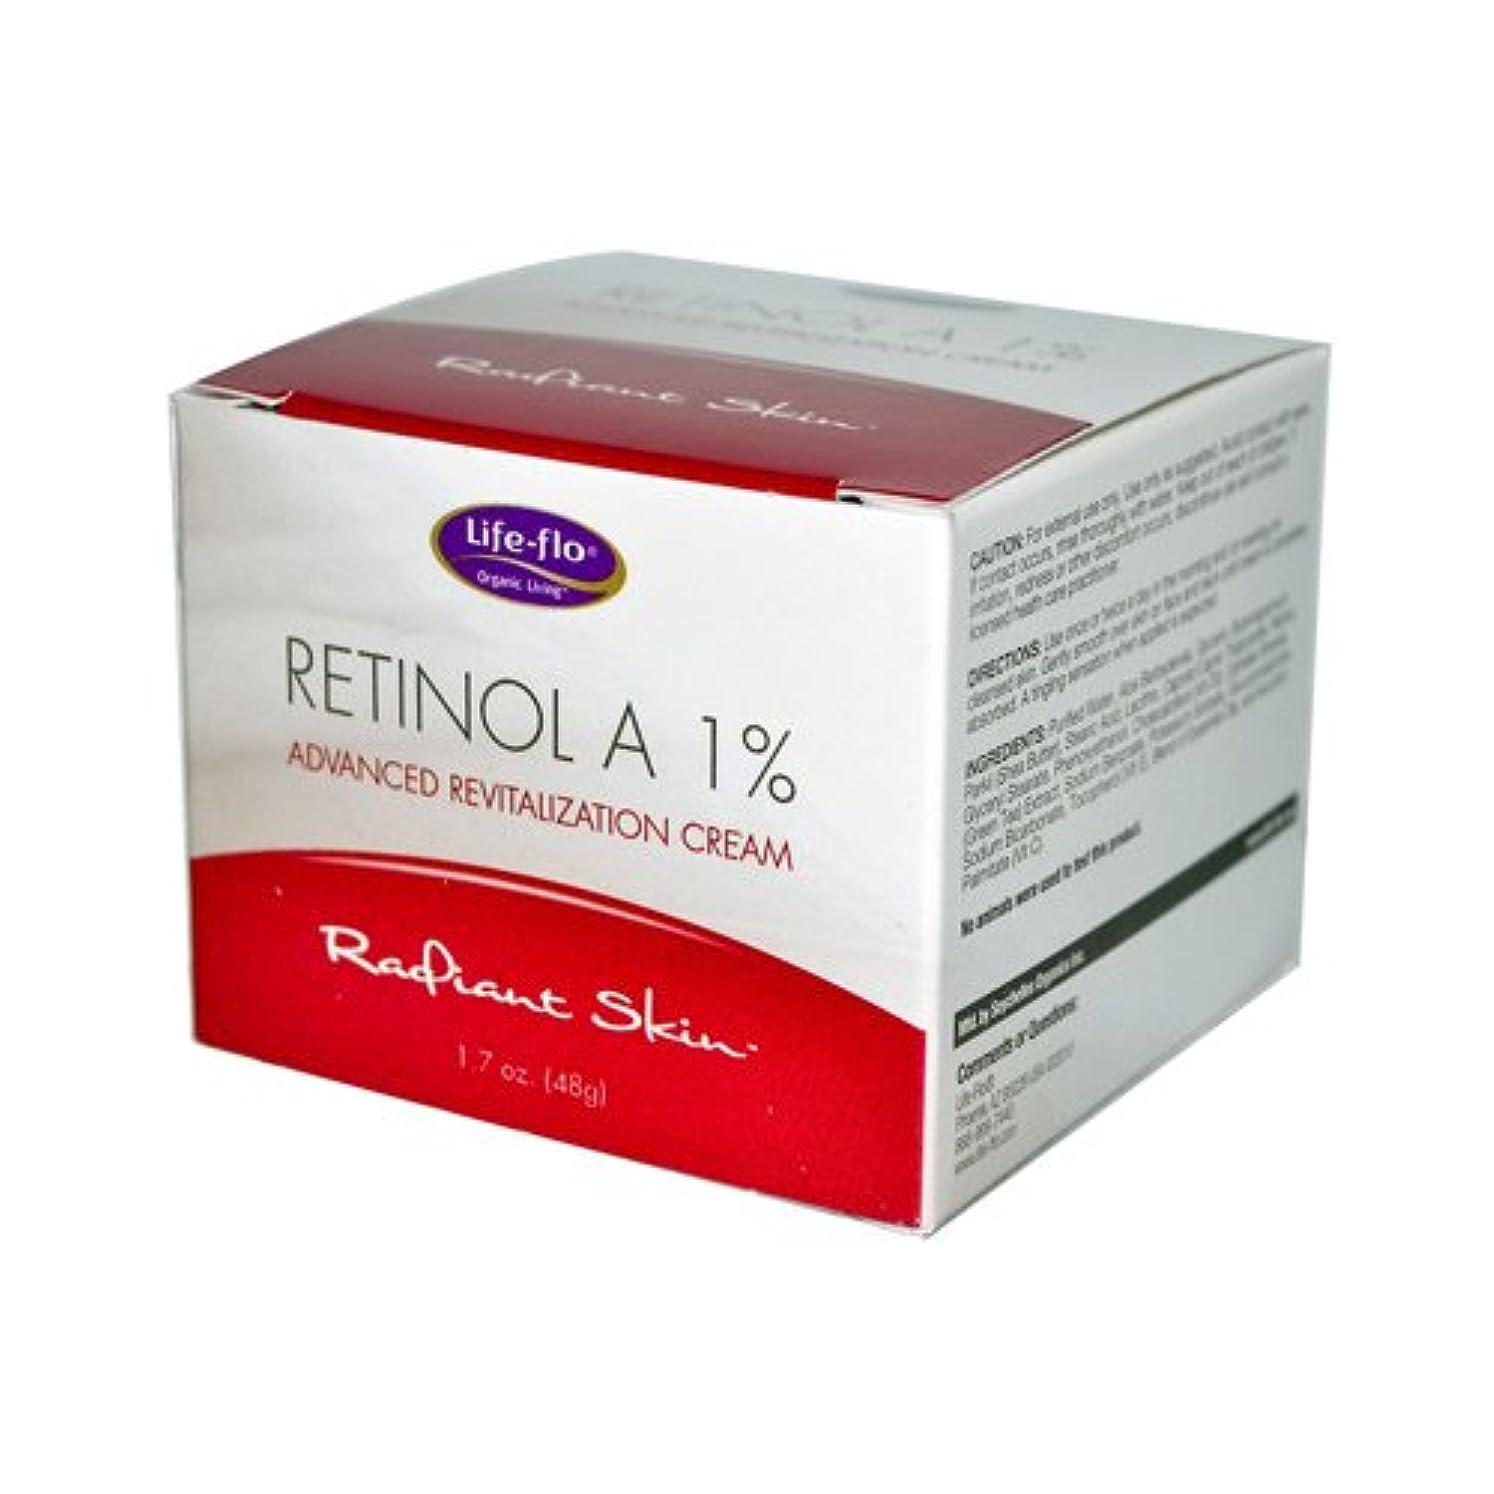 物質国旗実験的海外直送品 Life-Flo Retinol A 1% Advanced Revitalization Cream, 1.7 oz